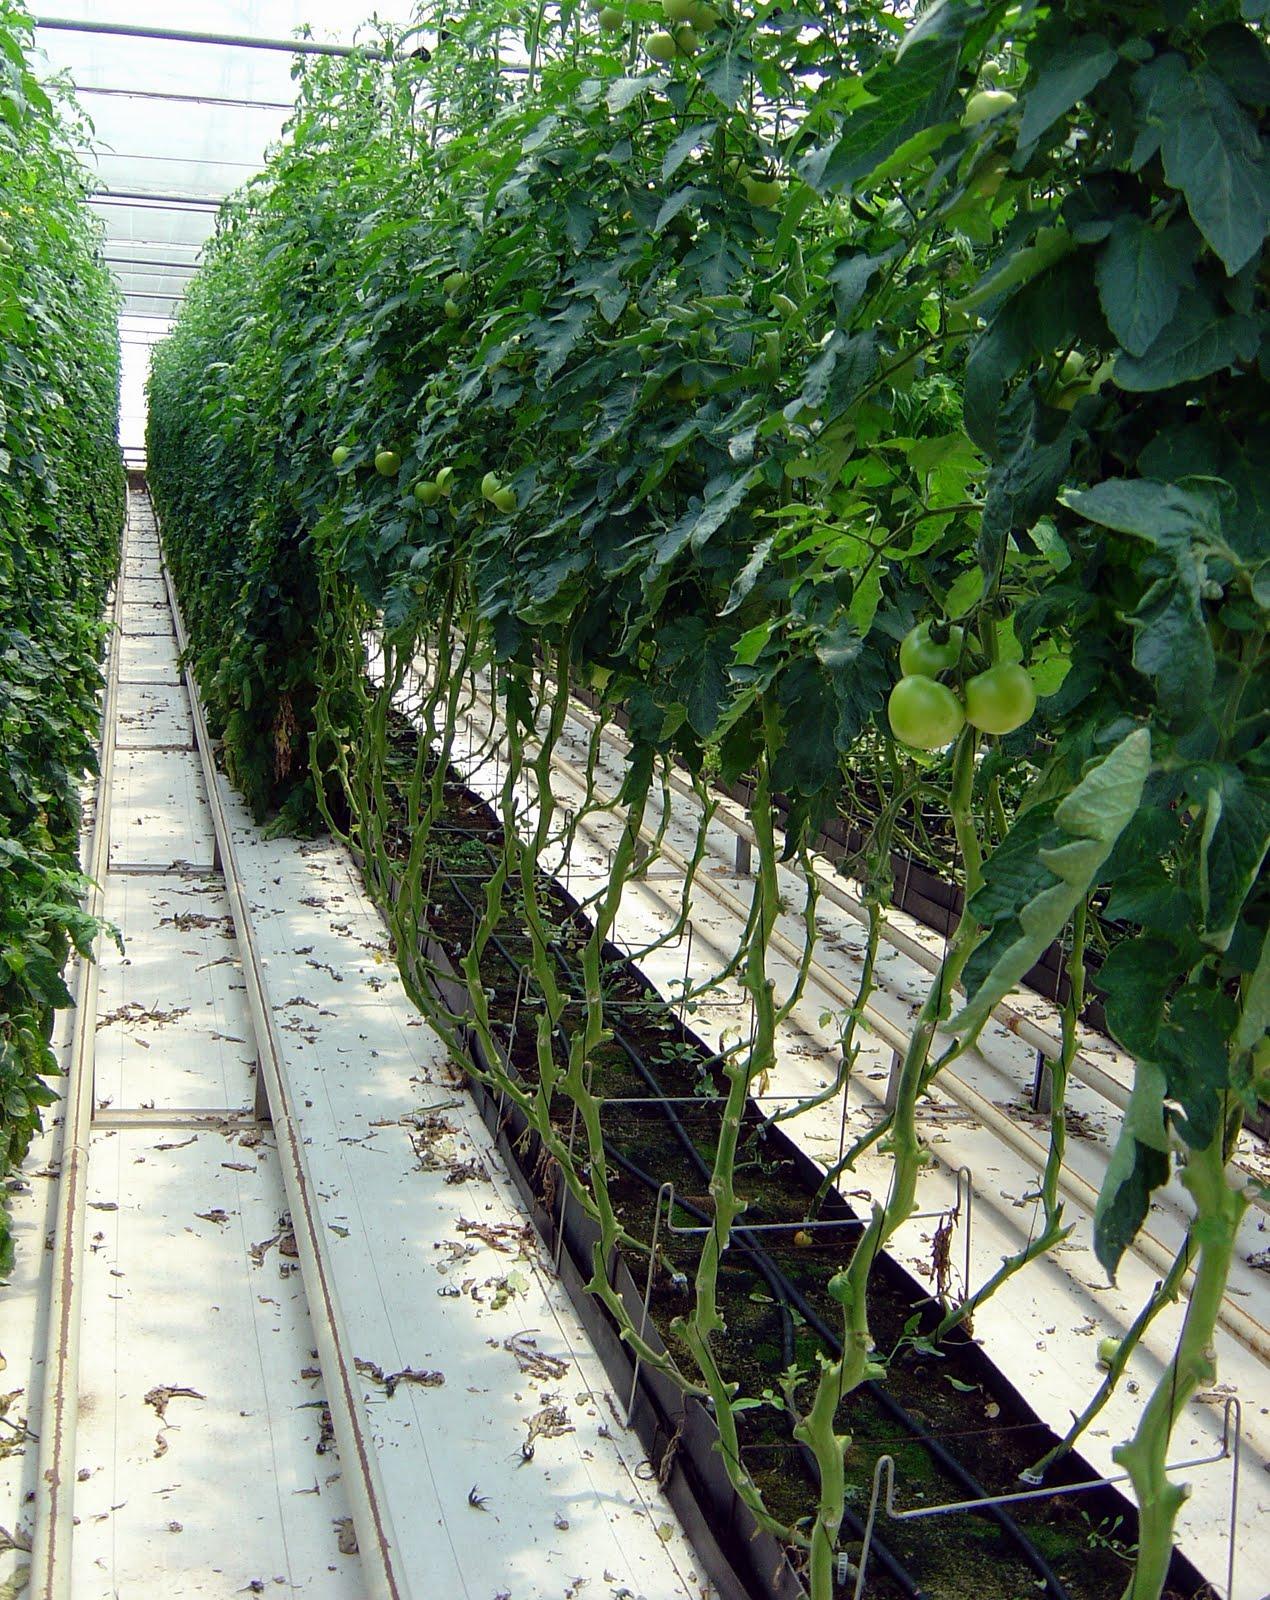 Cultivos hidropnicos cultivos hidropnicos with cultivos for Que son cultivos asociados